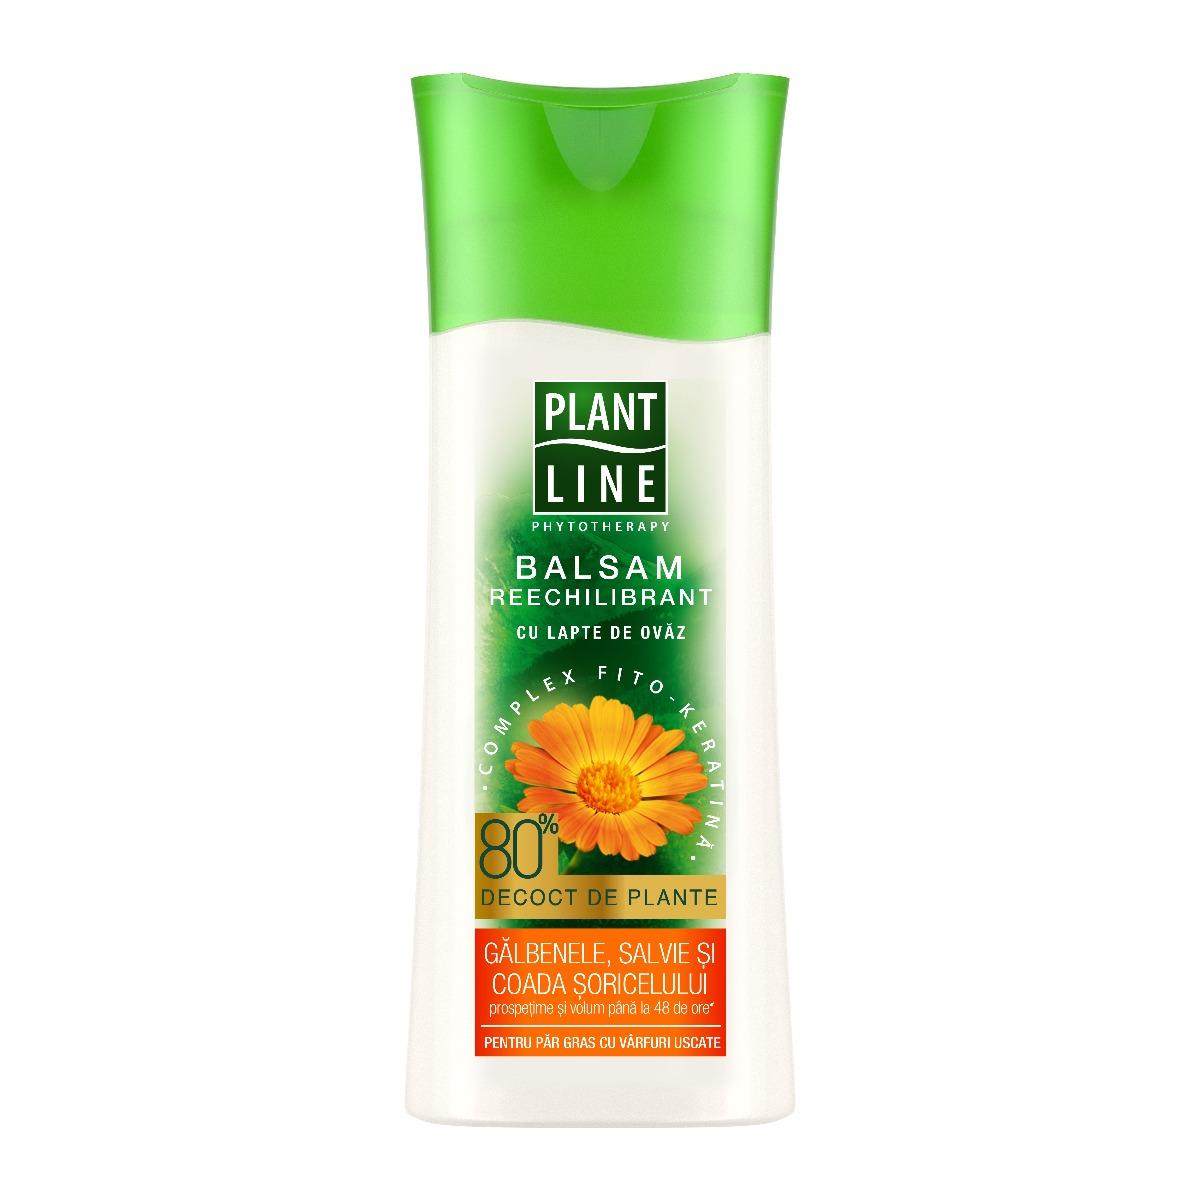 Balsam cu extract de galbenele Plant Line, 230 ml imagine